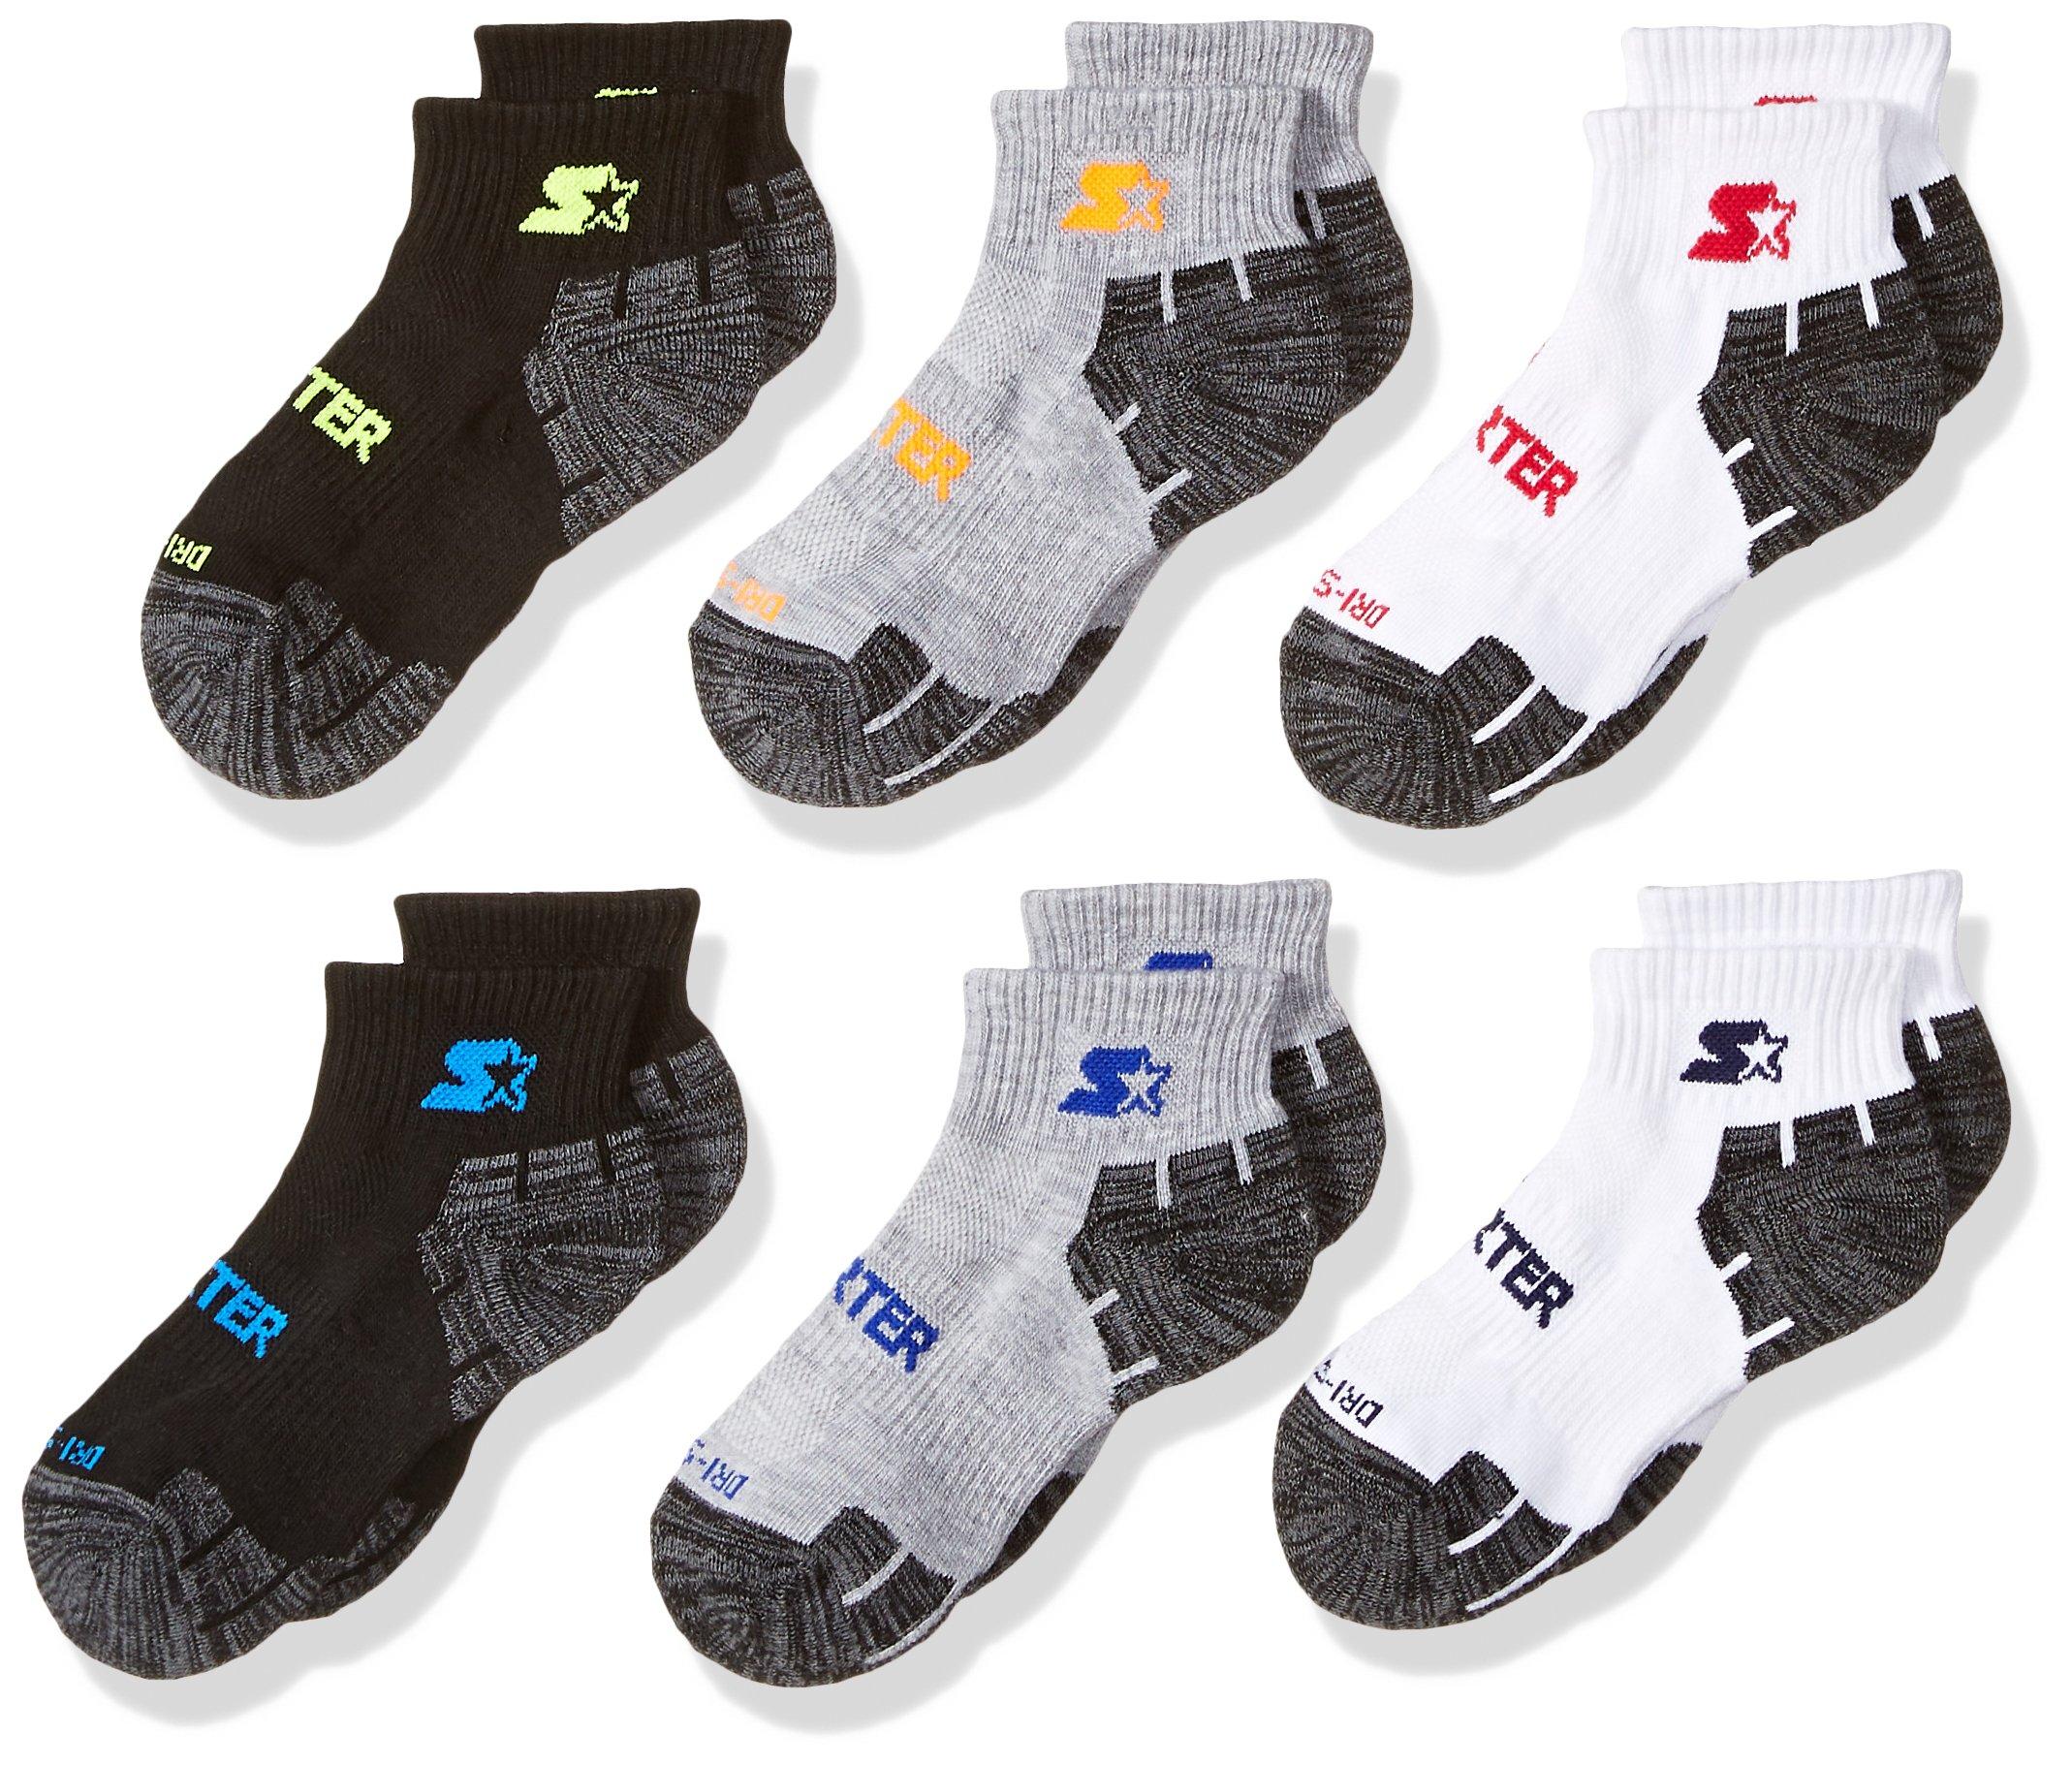 Starter Boys' 6-Pack Quarter-Length Athletic Socks, Amazon Exclusive, White/Black/Vapor Grey, Small (Shoe Size 9-3.5)